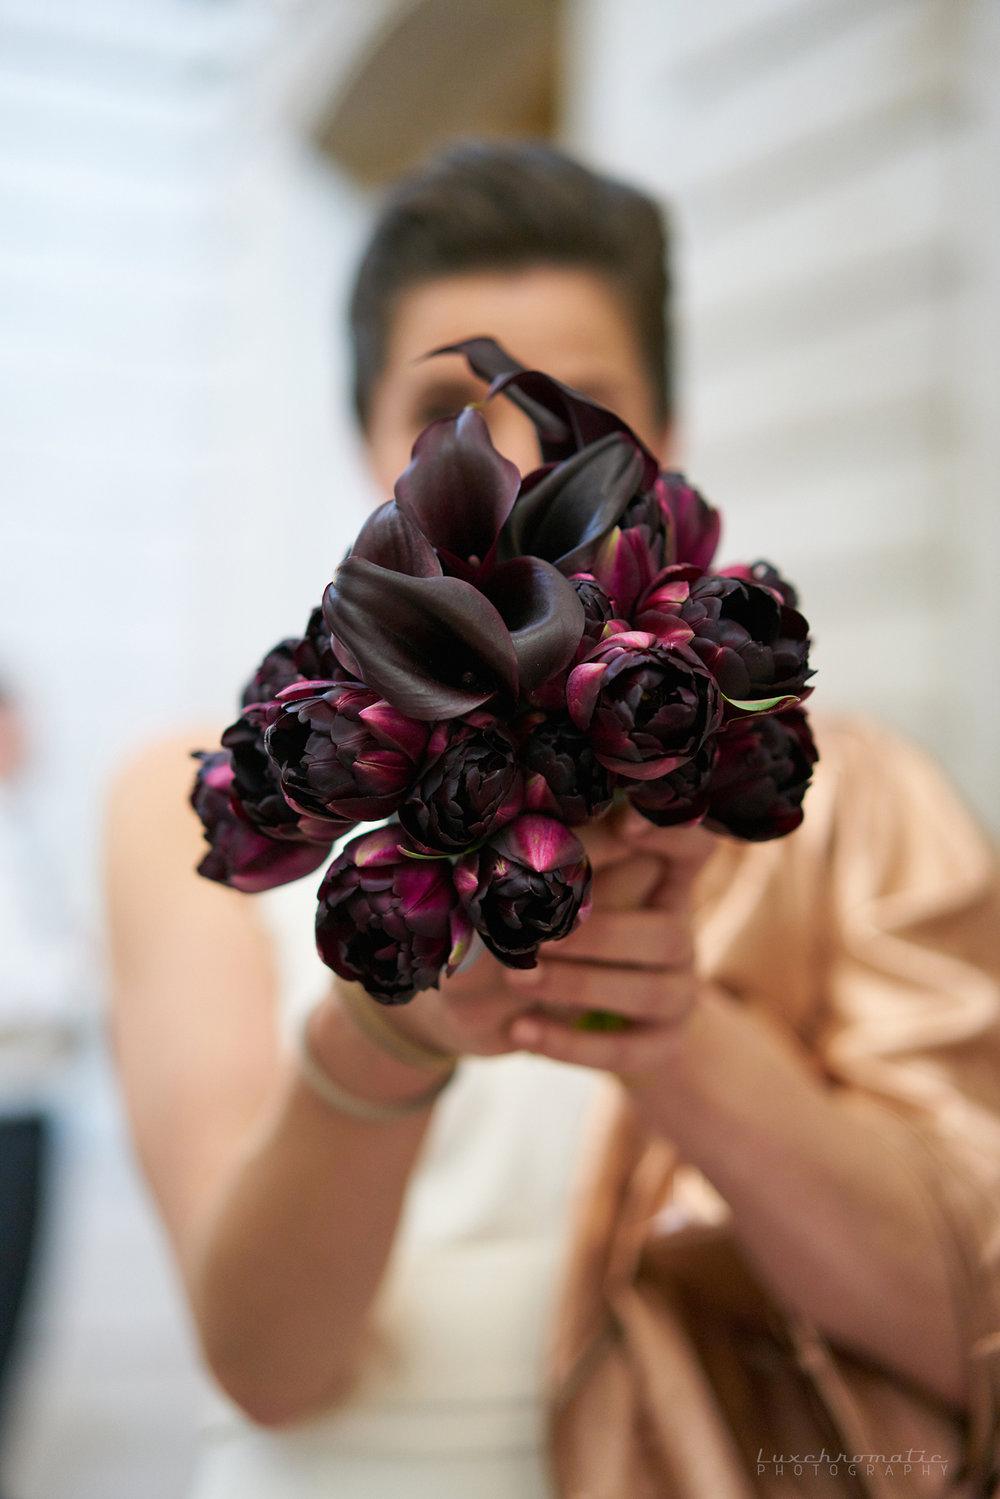 040318_Erin_Brent_0009-weddingdress-bride-weddingphotography-weddingphotographer-bridal-groom-wedding-engagementring-proposal-brides-elopement-sonyalpha-sony-sonya9-sonya7riii-sanfrancisco-sf-bayarea-photographer-profoto-city-hall.jpg